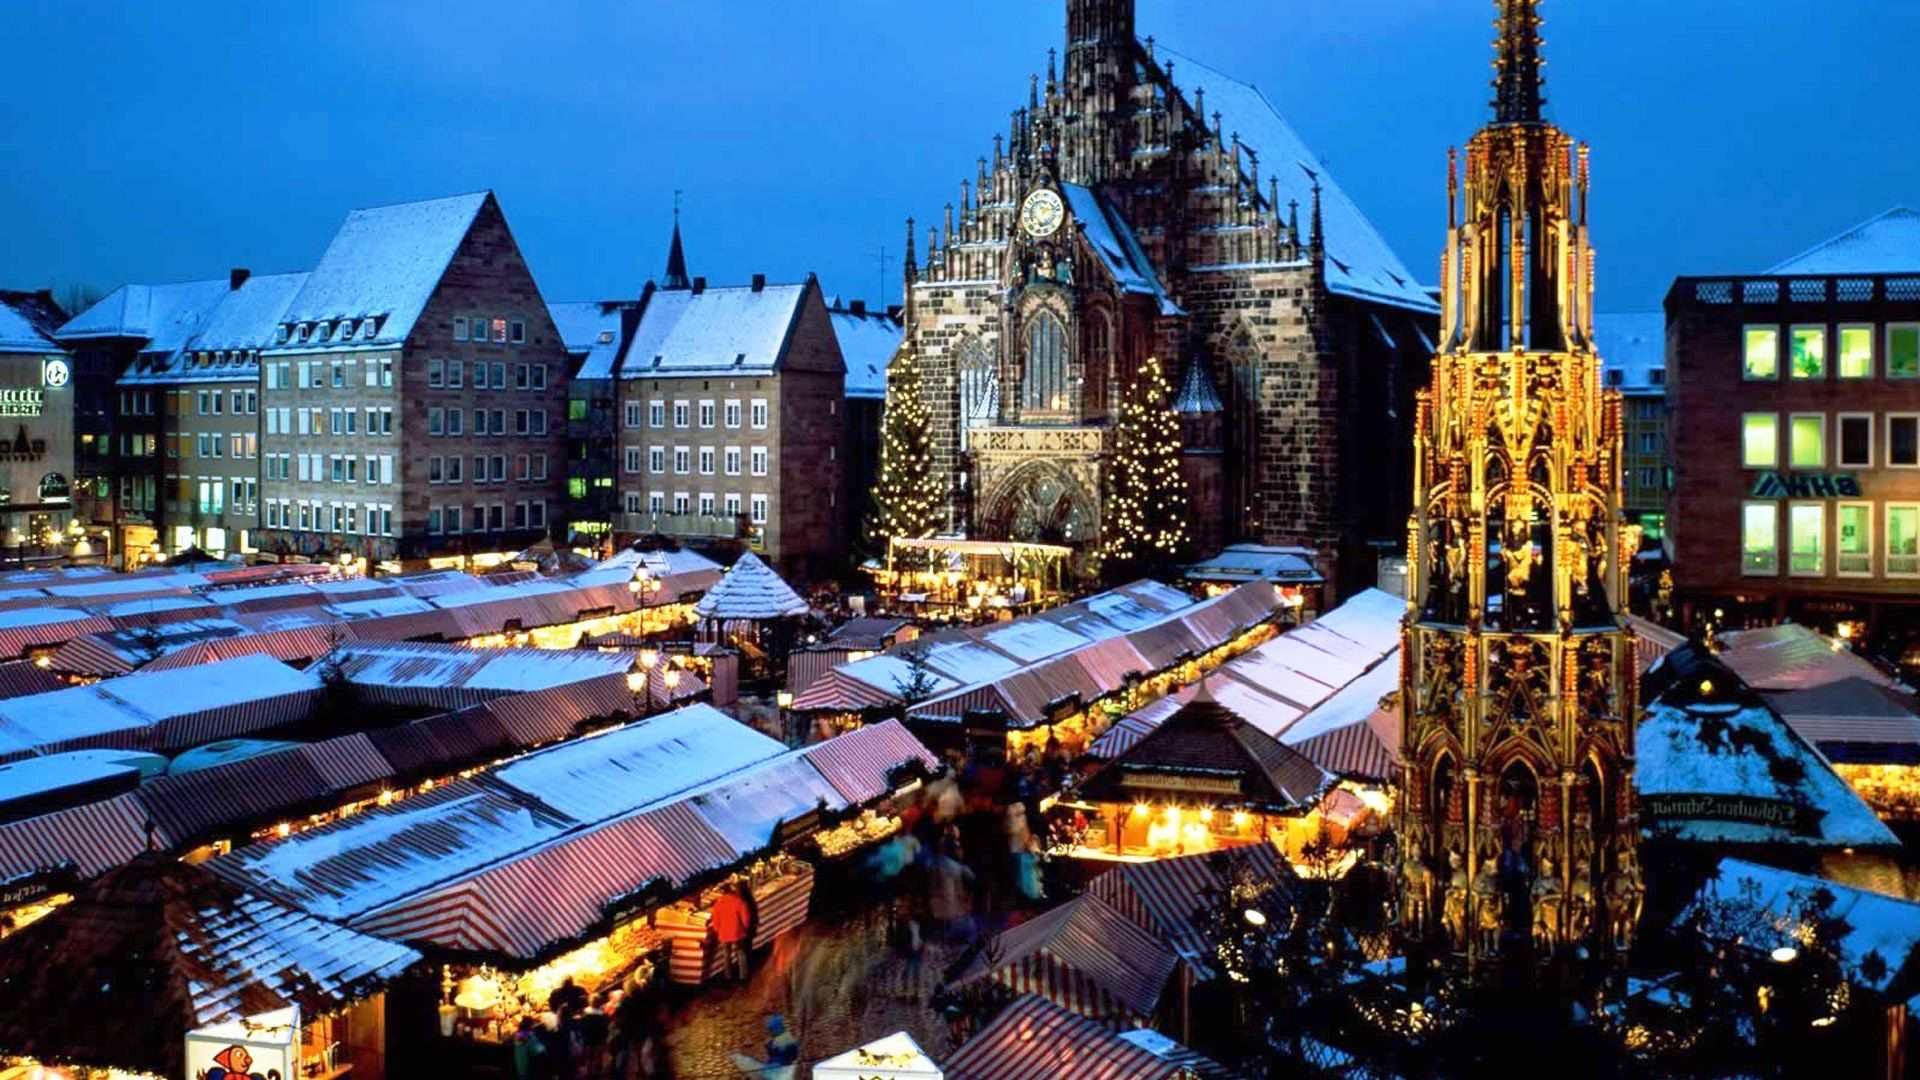 Christkindl Markt, Nuremberg   Christmas   Pinterest   Bavaria and ...